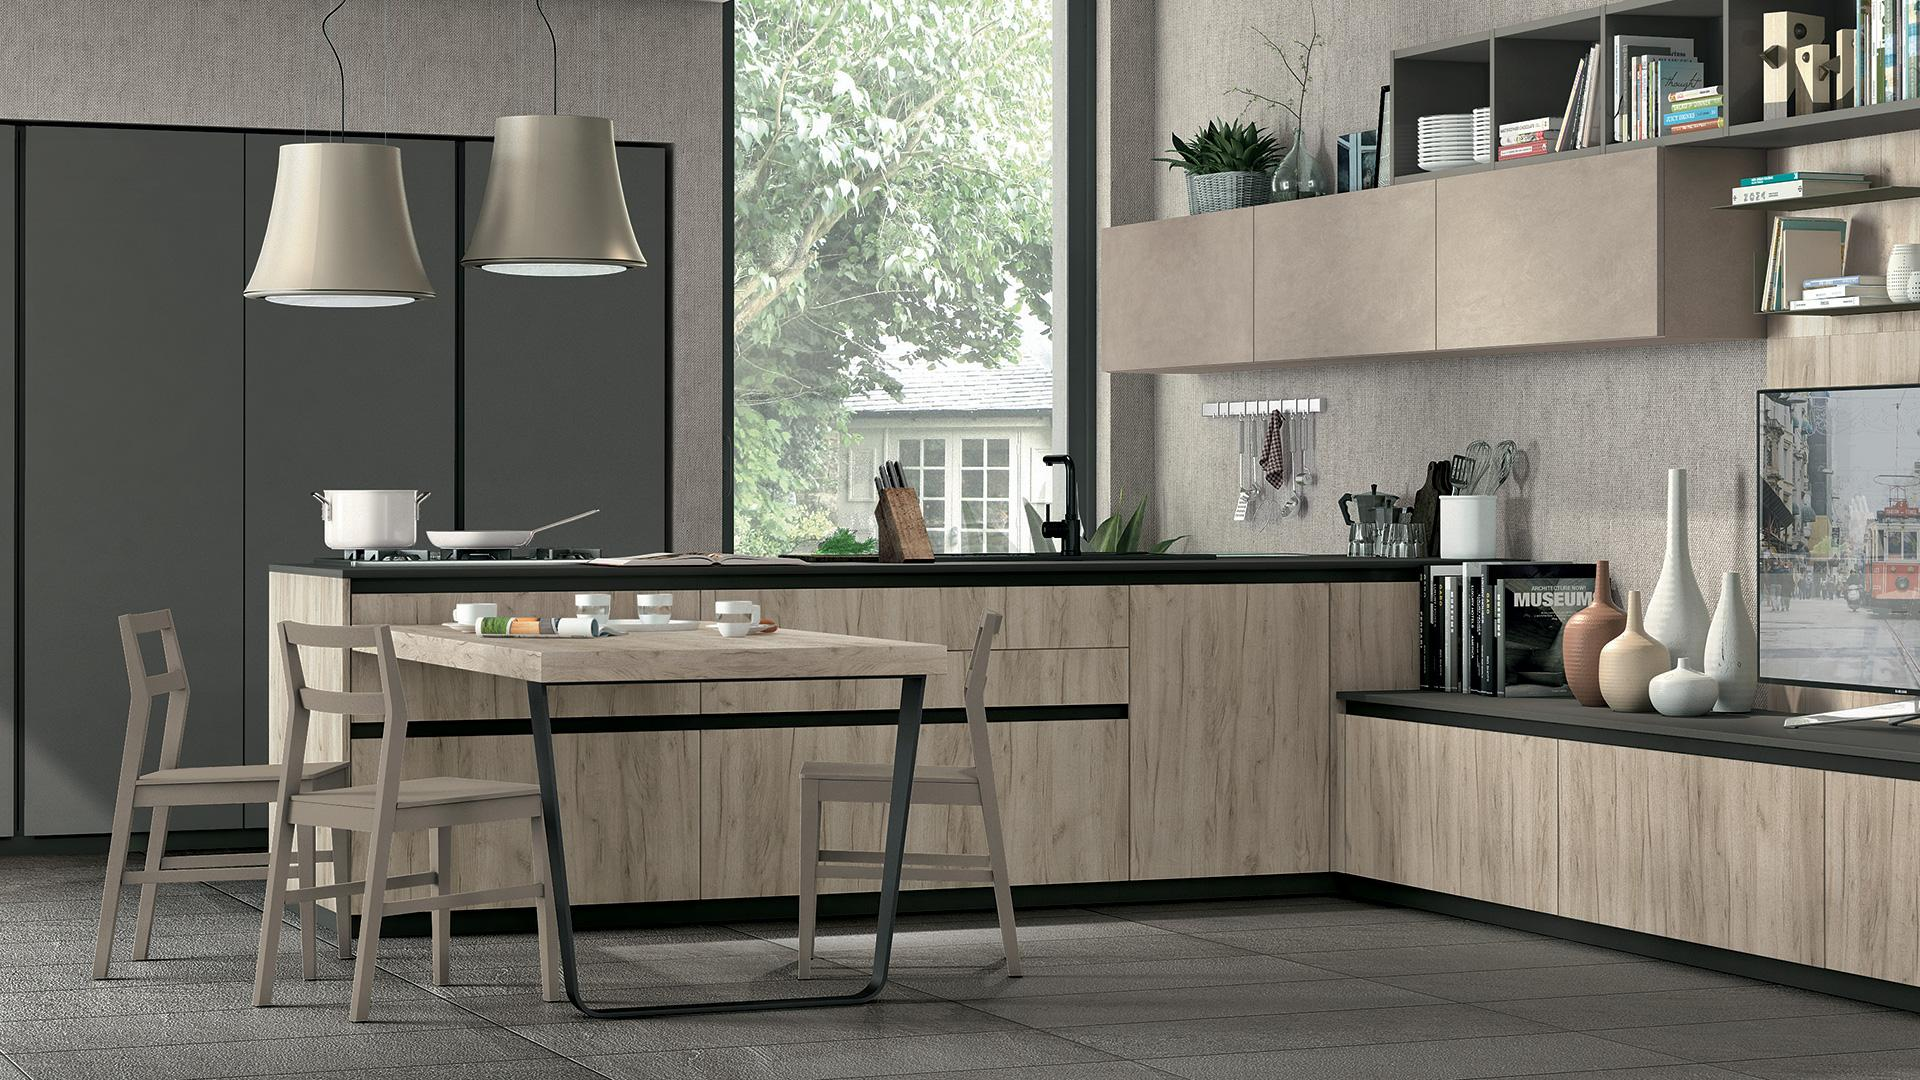 Le nuove cucine moderne lube store milano le cucine - Cucine belle moderne ...